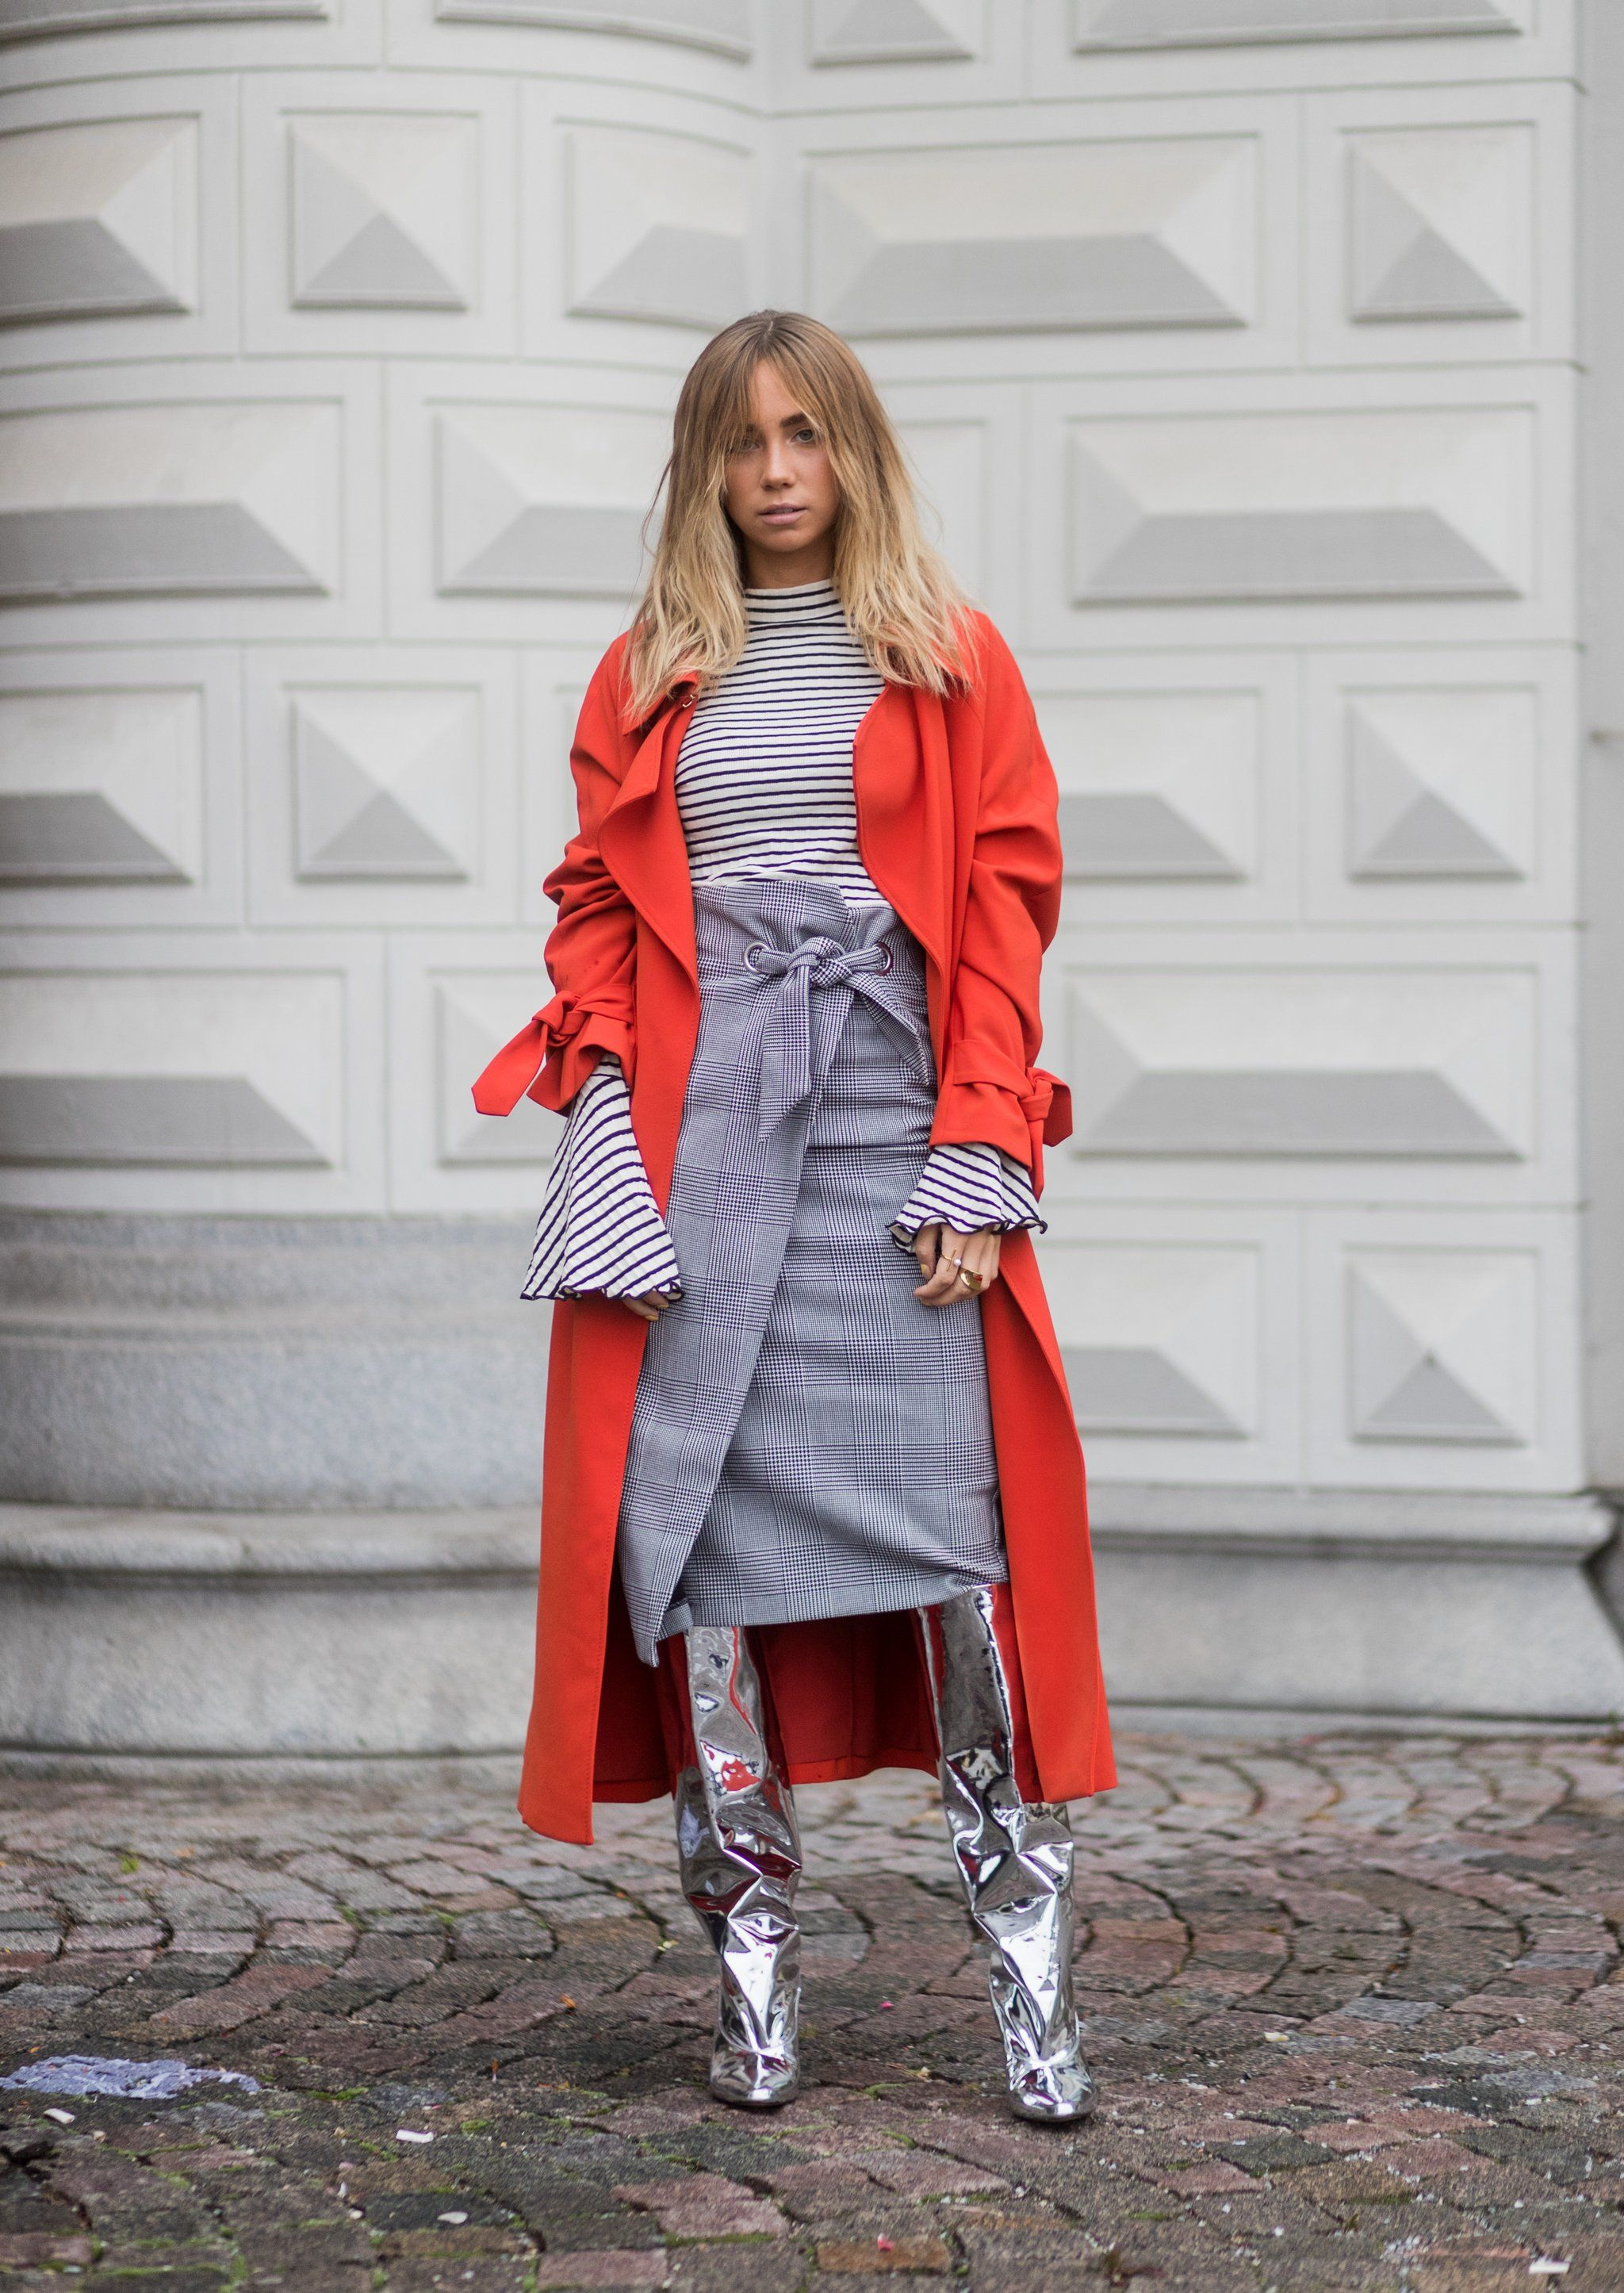 Who Is Gigi Liscio Hookup 2018